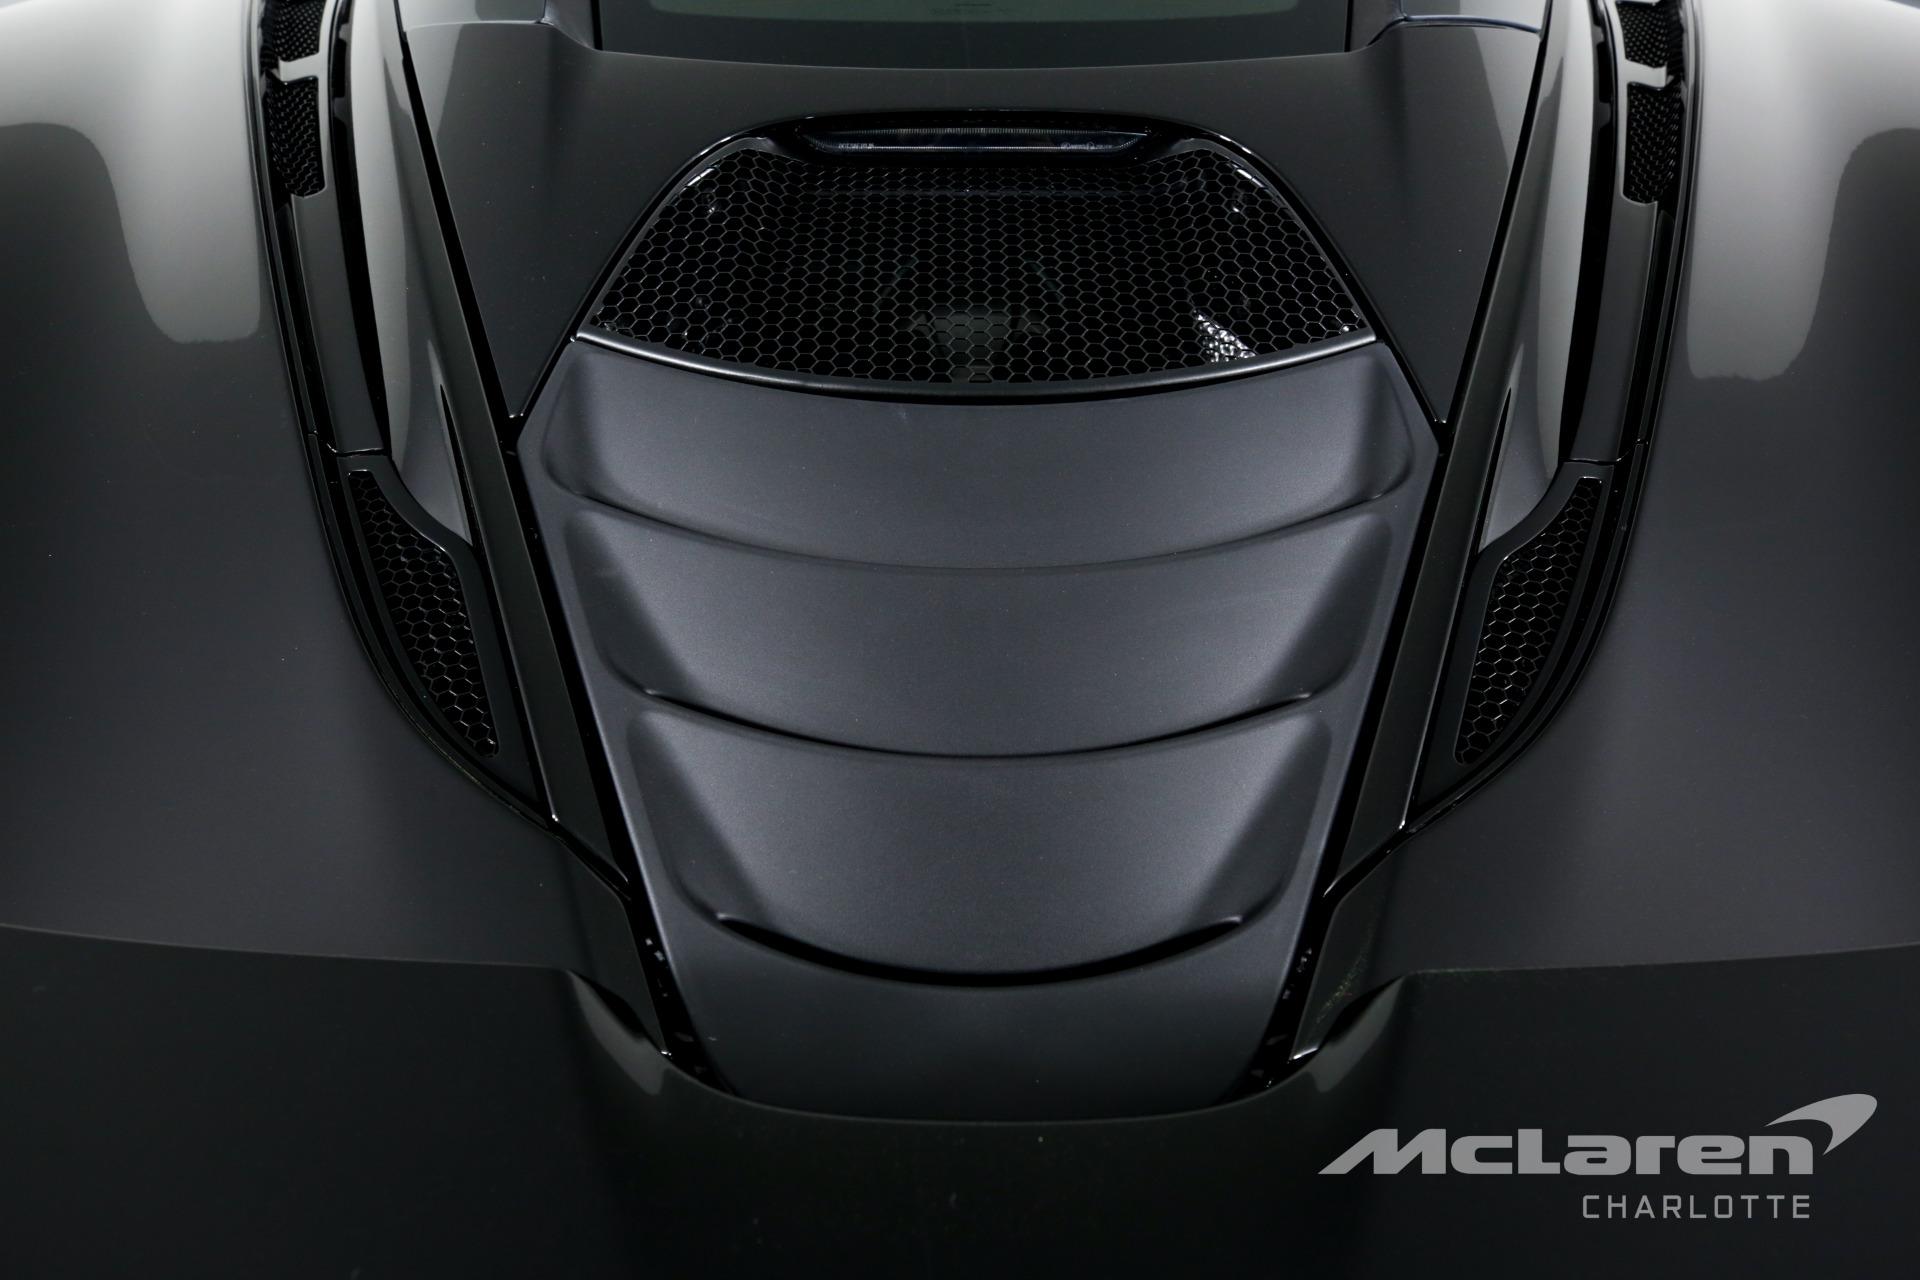 New 2020 MCLAREN 720S PERFORMANCE | Charlotte, NC